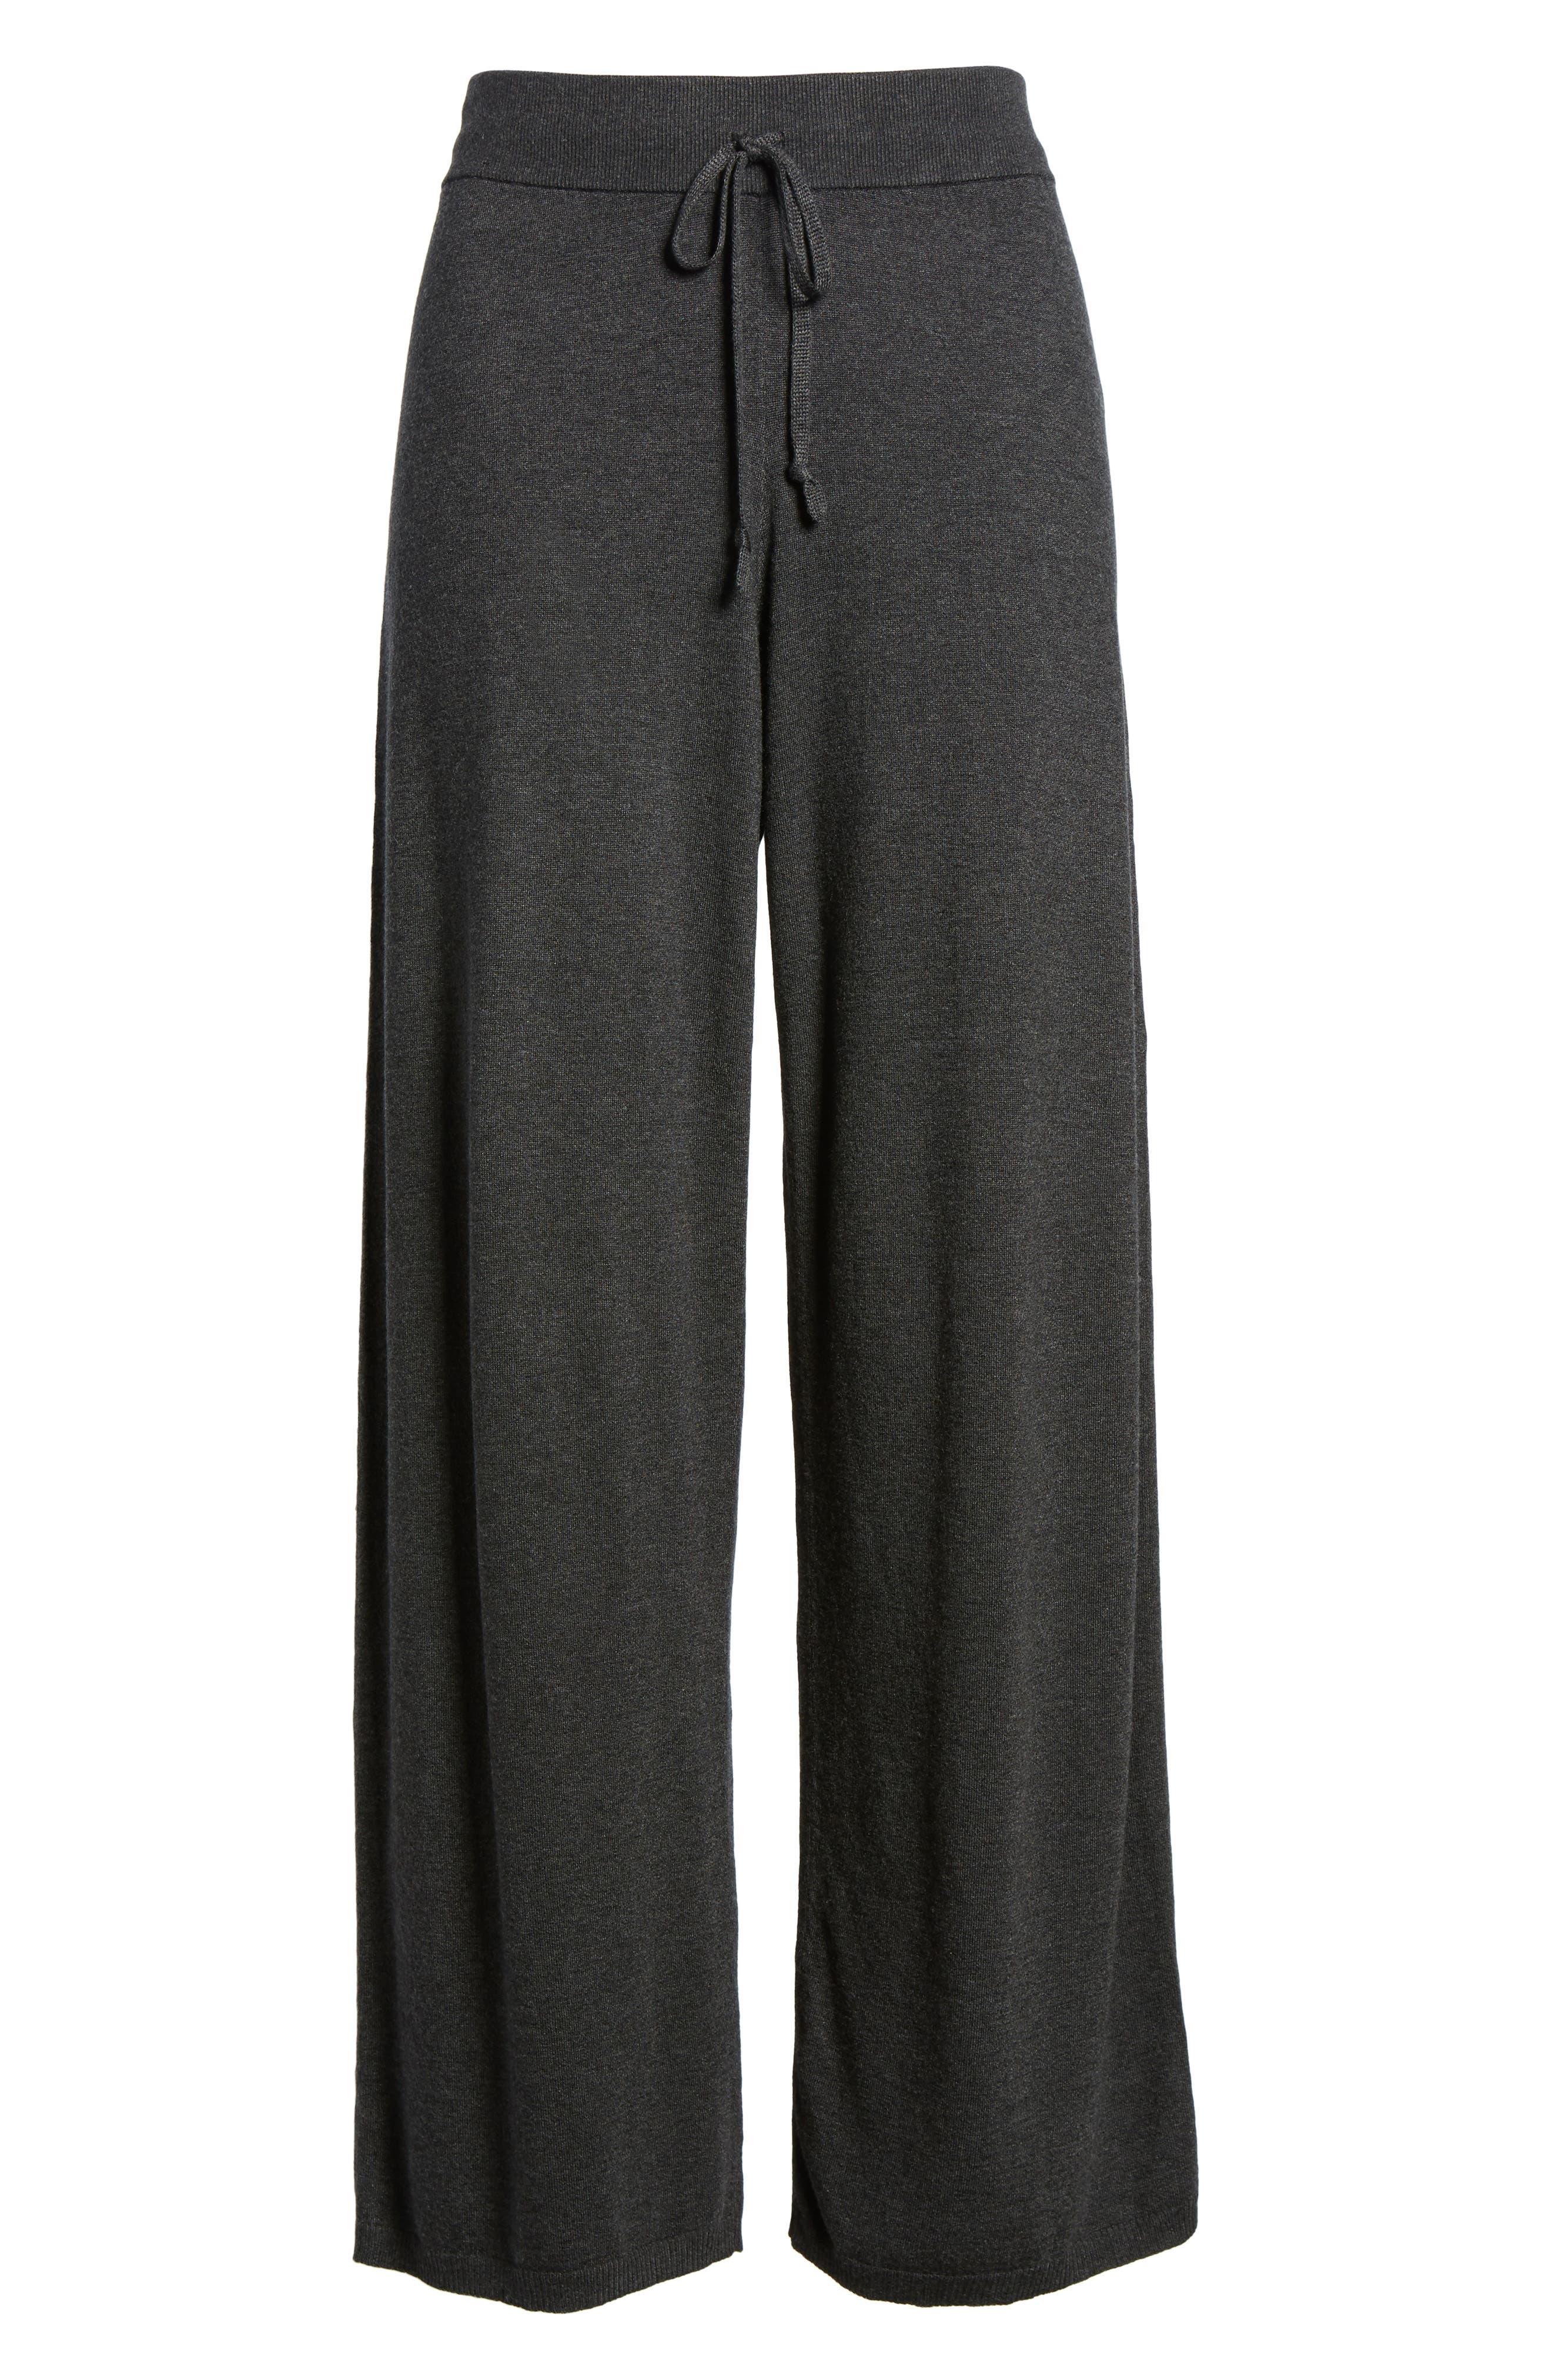 Tencel<sup>®</sup> Lyocell Blend Knit Wide Leg Pants,                             Alternate thumbnail 6, color,